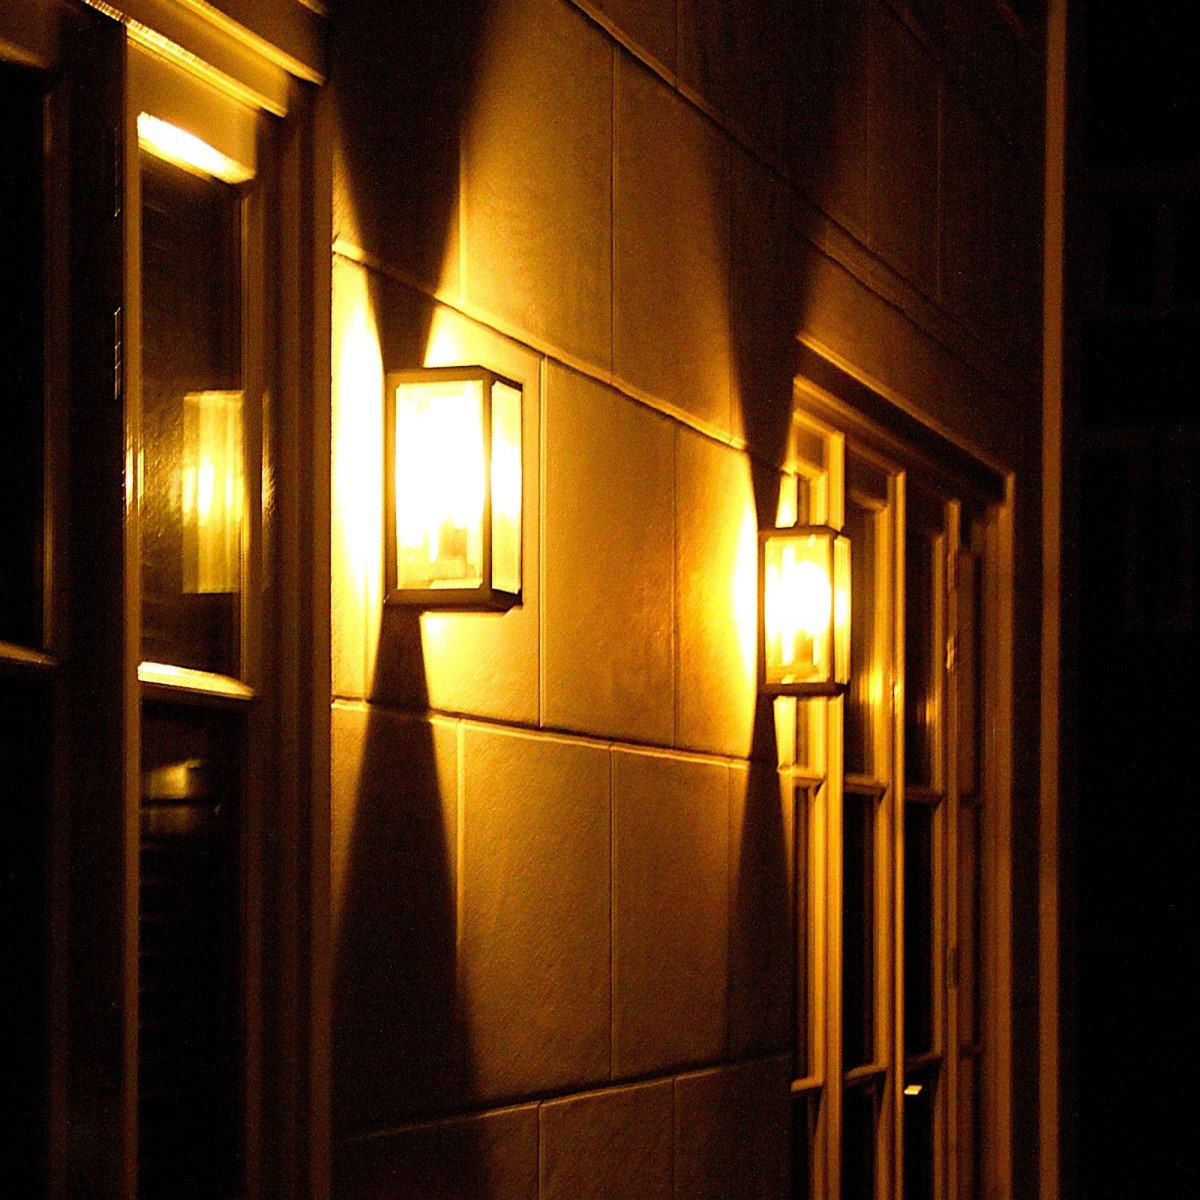 verandalamp buitenlamp - 't Gooi klein (7293D4) - KS Verlichting - wandlamp - muurlamp - buitenlamp - Nostalux